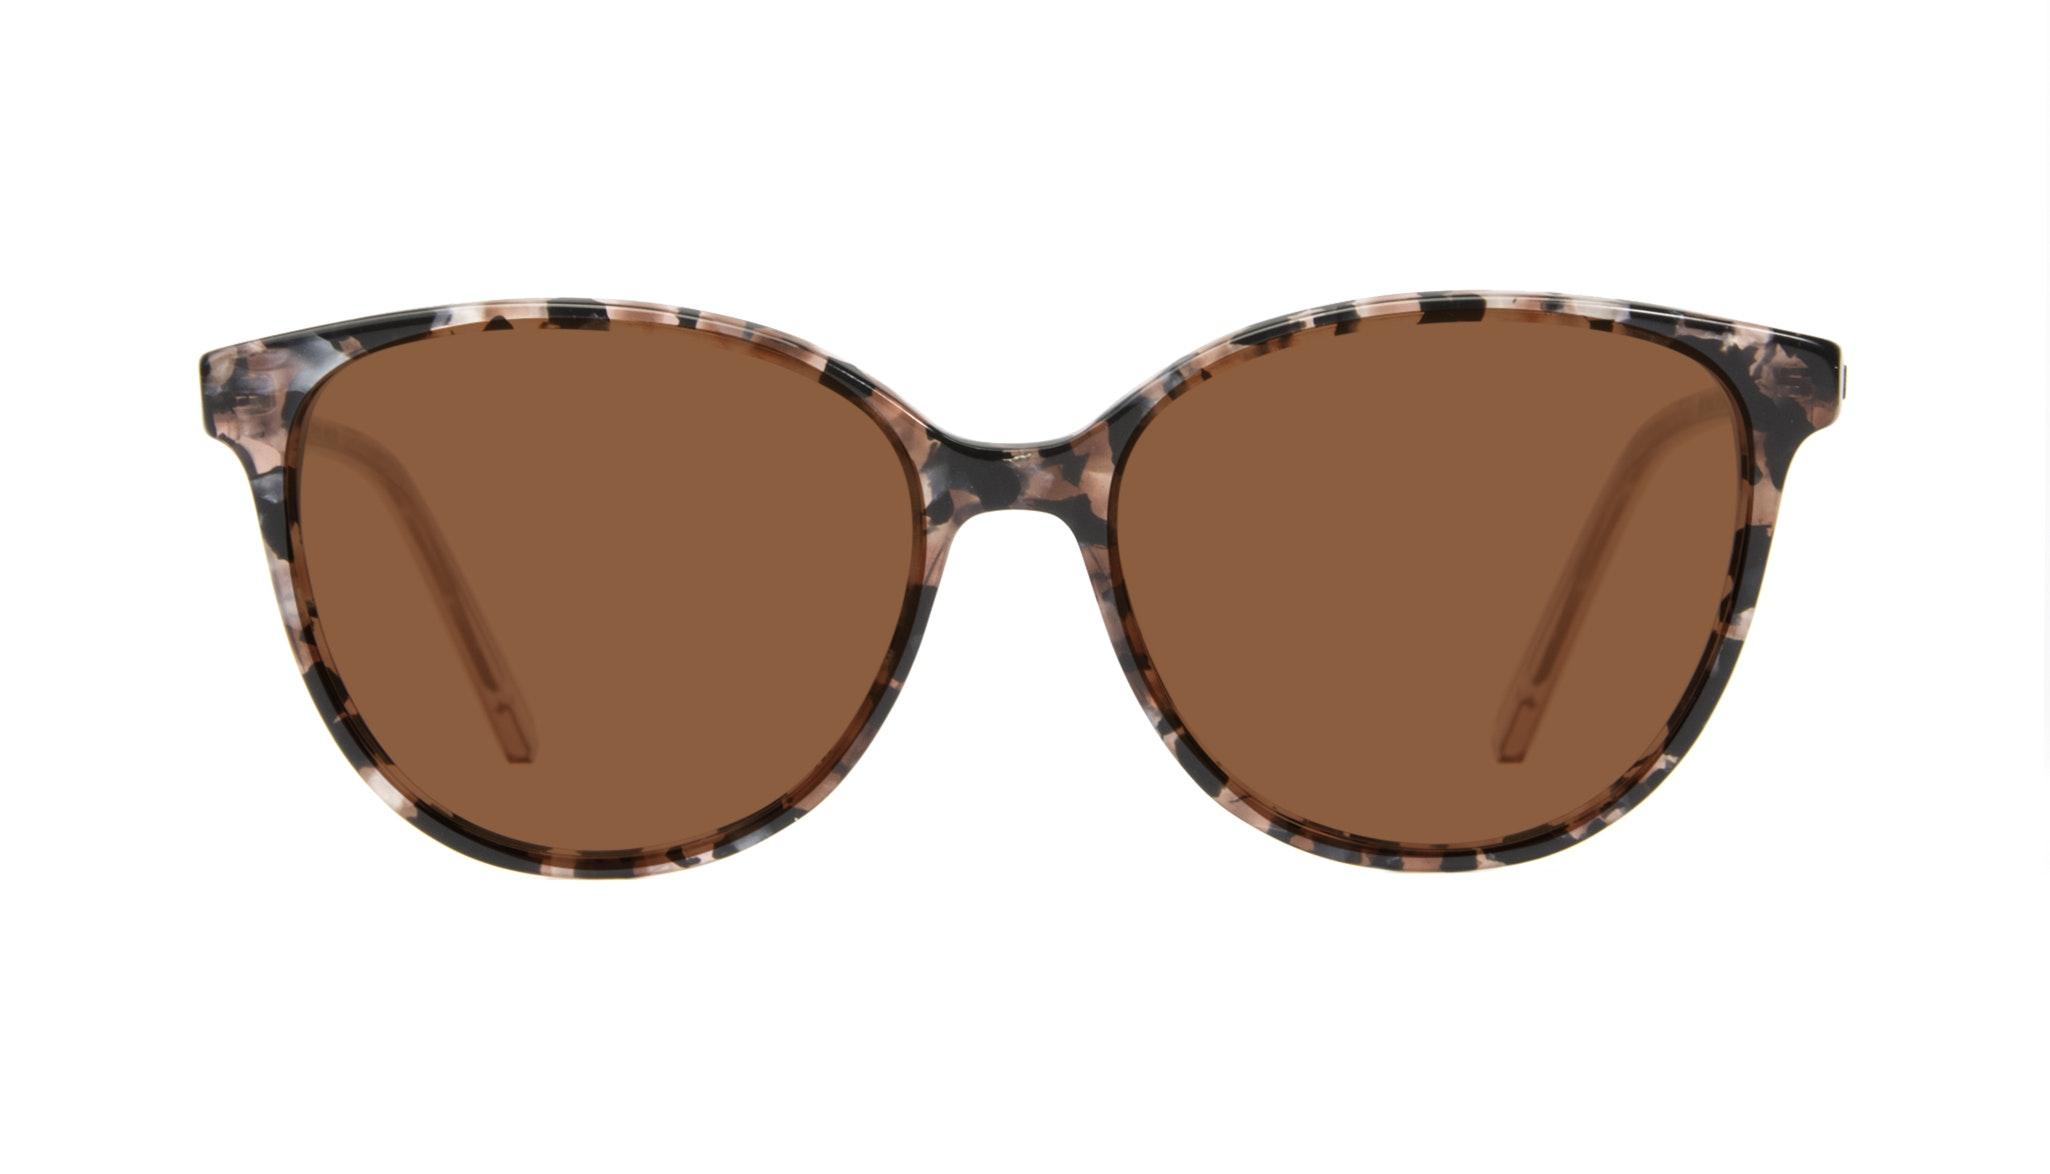 Affordable Fashion Glasses Cat Eye Sunglasses Women Imagine II Pink Tortoise Front